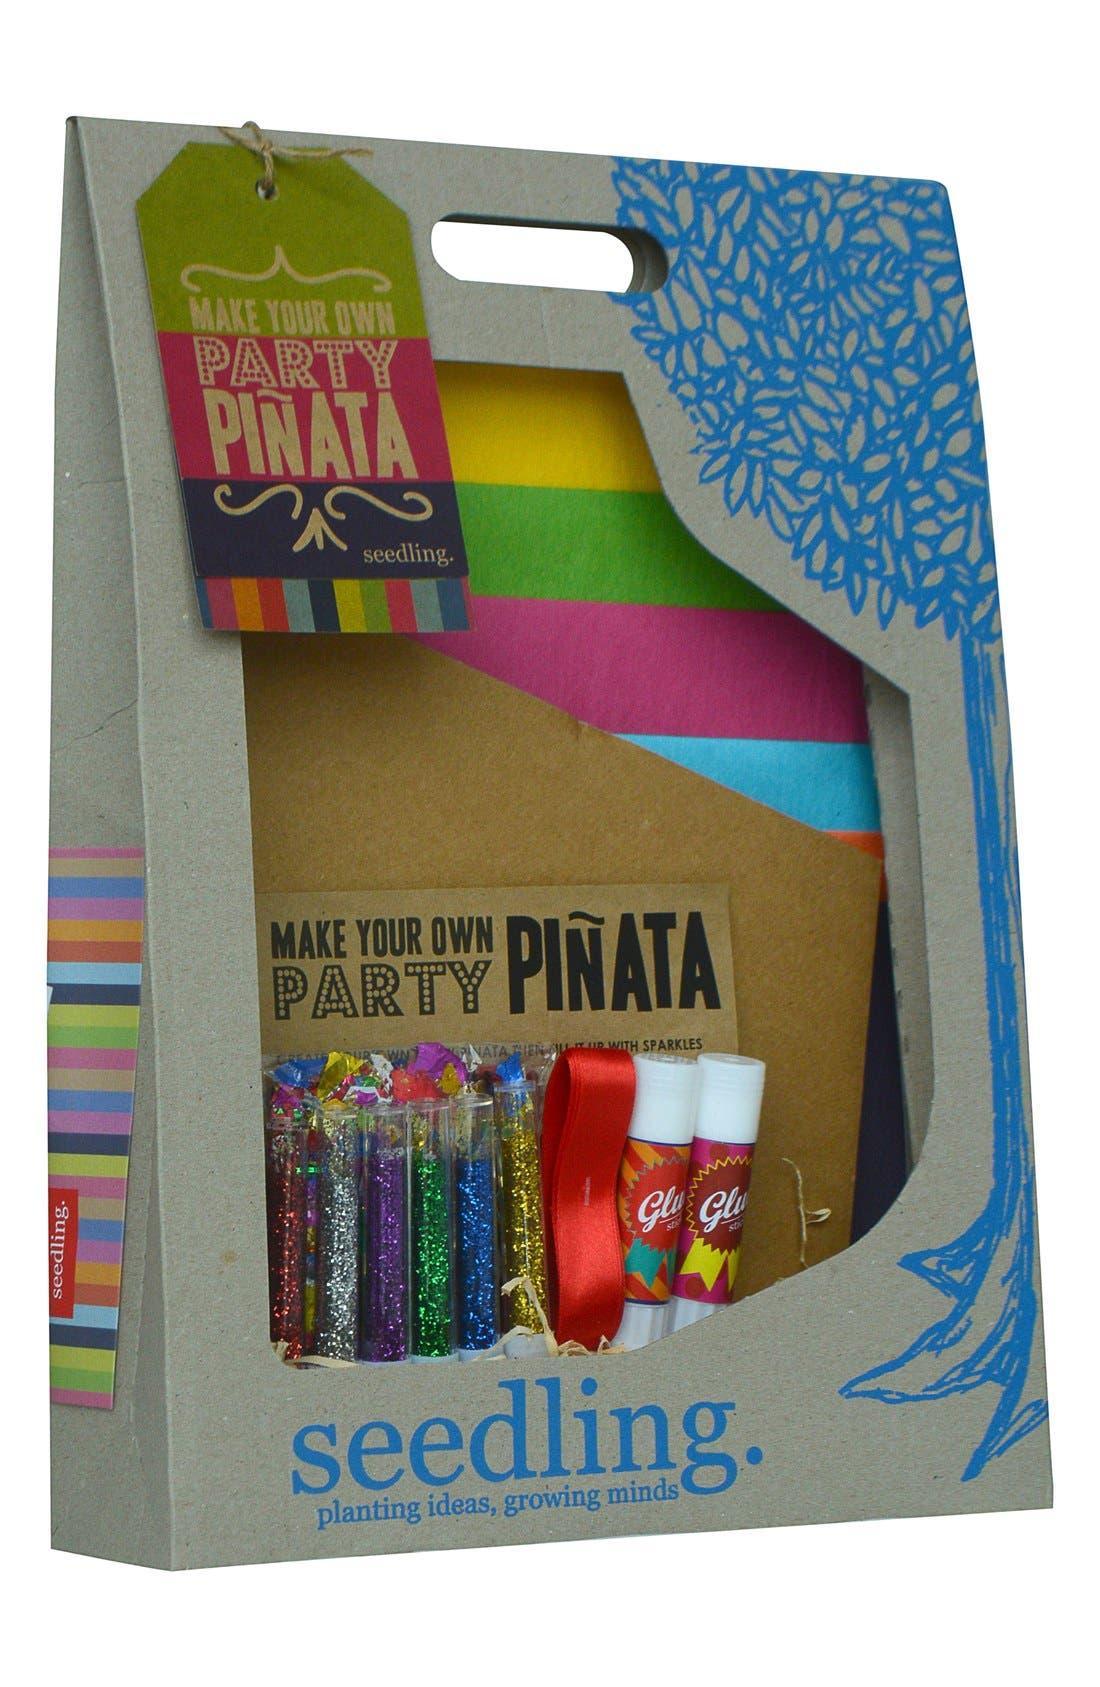 SEEDLING 'Make Your Own Party Piñata' Kit